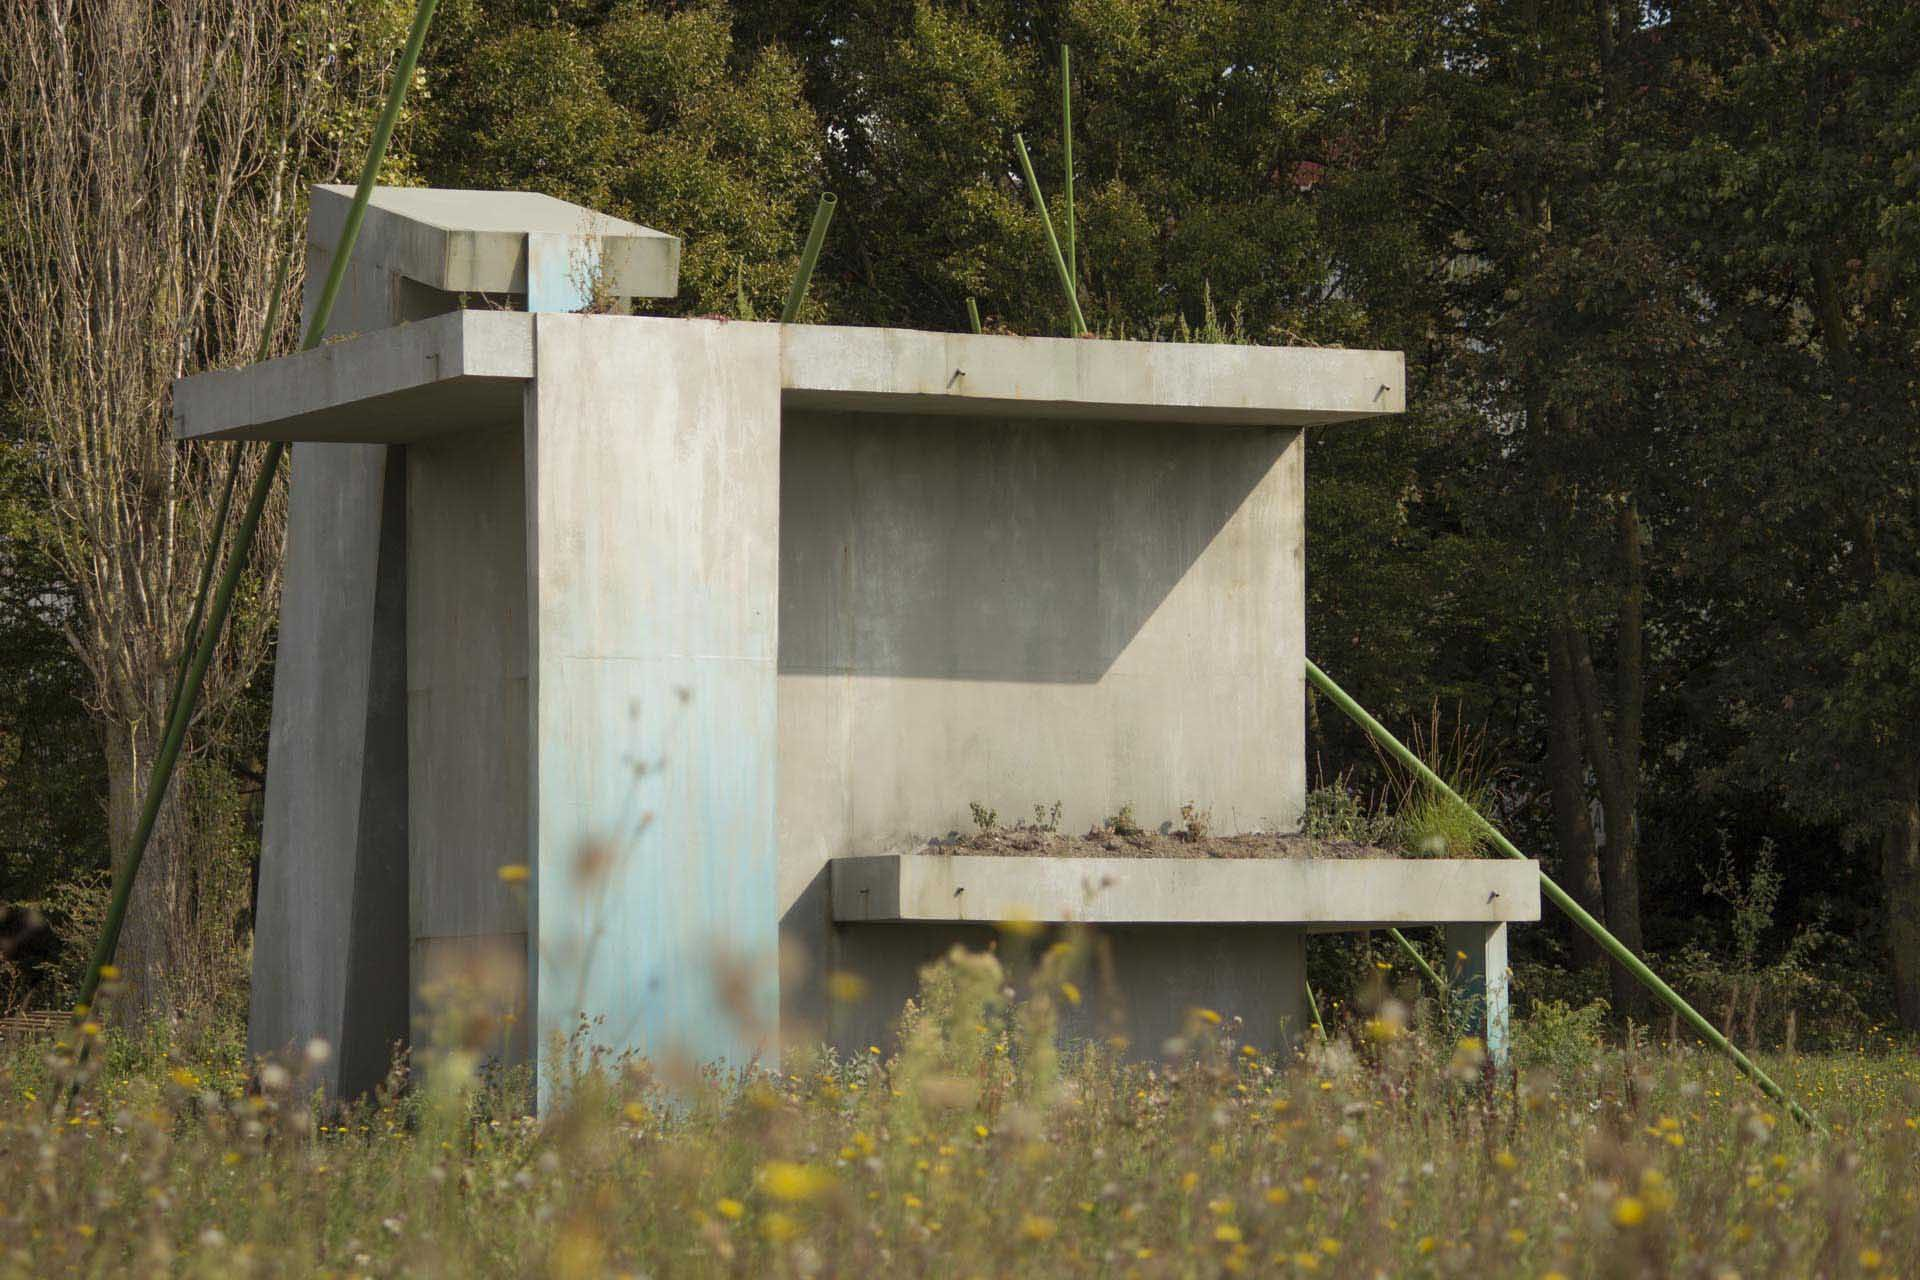 roubens-duquenne-abstract-organic-vegetal-concrete-sculpture-instal-monument-future-contemporary-paint-street-art-nature-valencienne_09